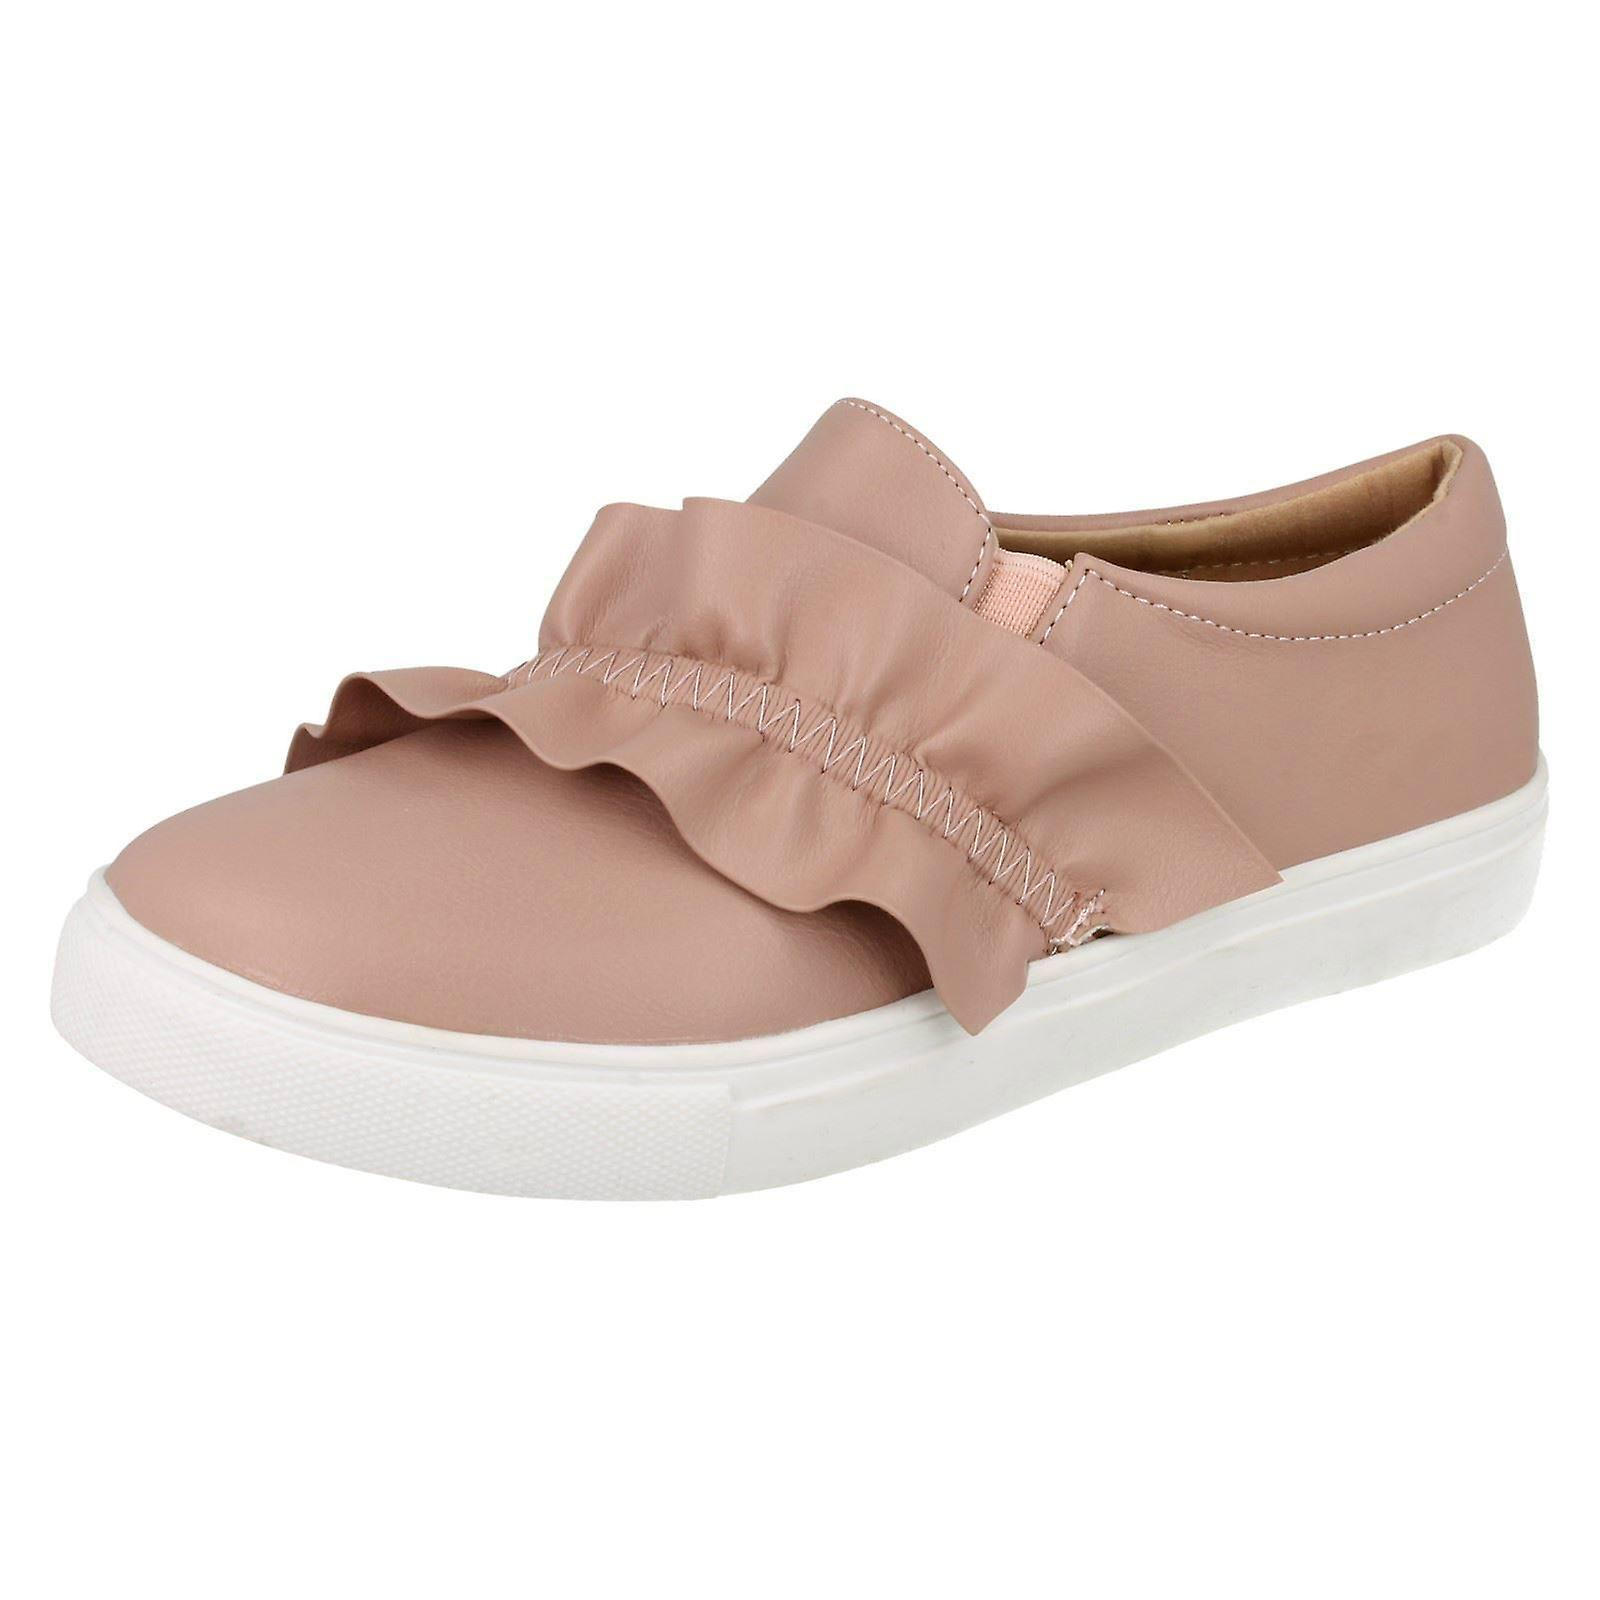 Girls Spot On Flat Ruffle Vamp Flat On Shoes H2458 df777d